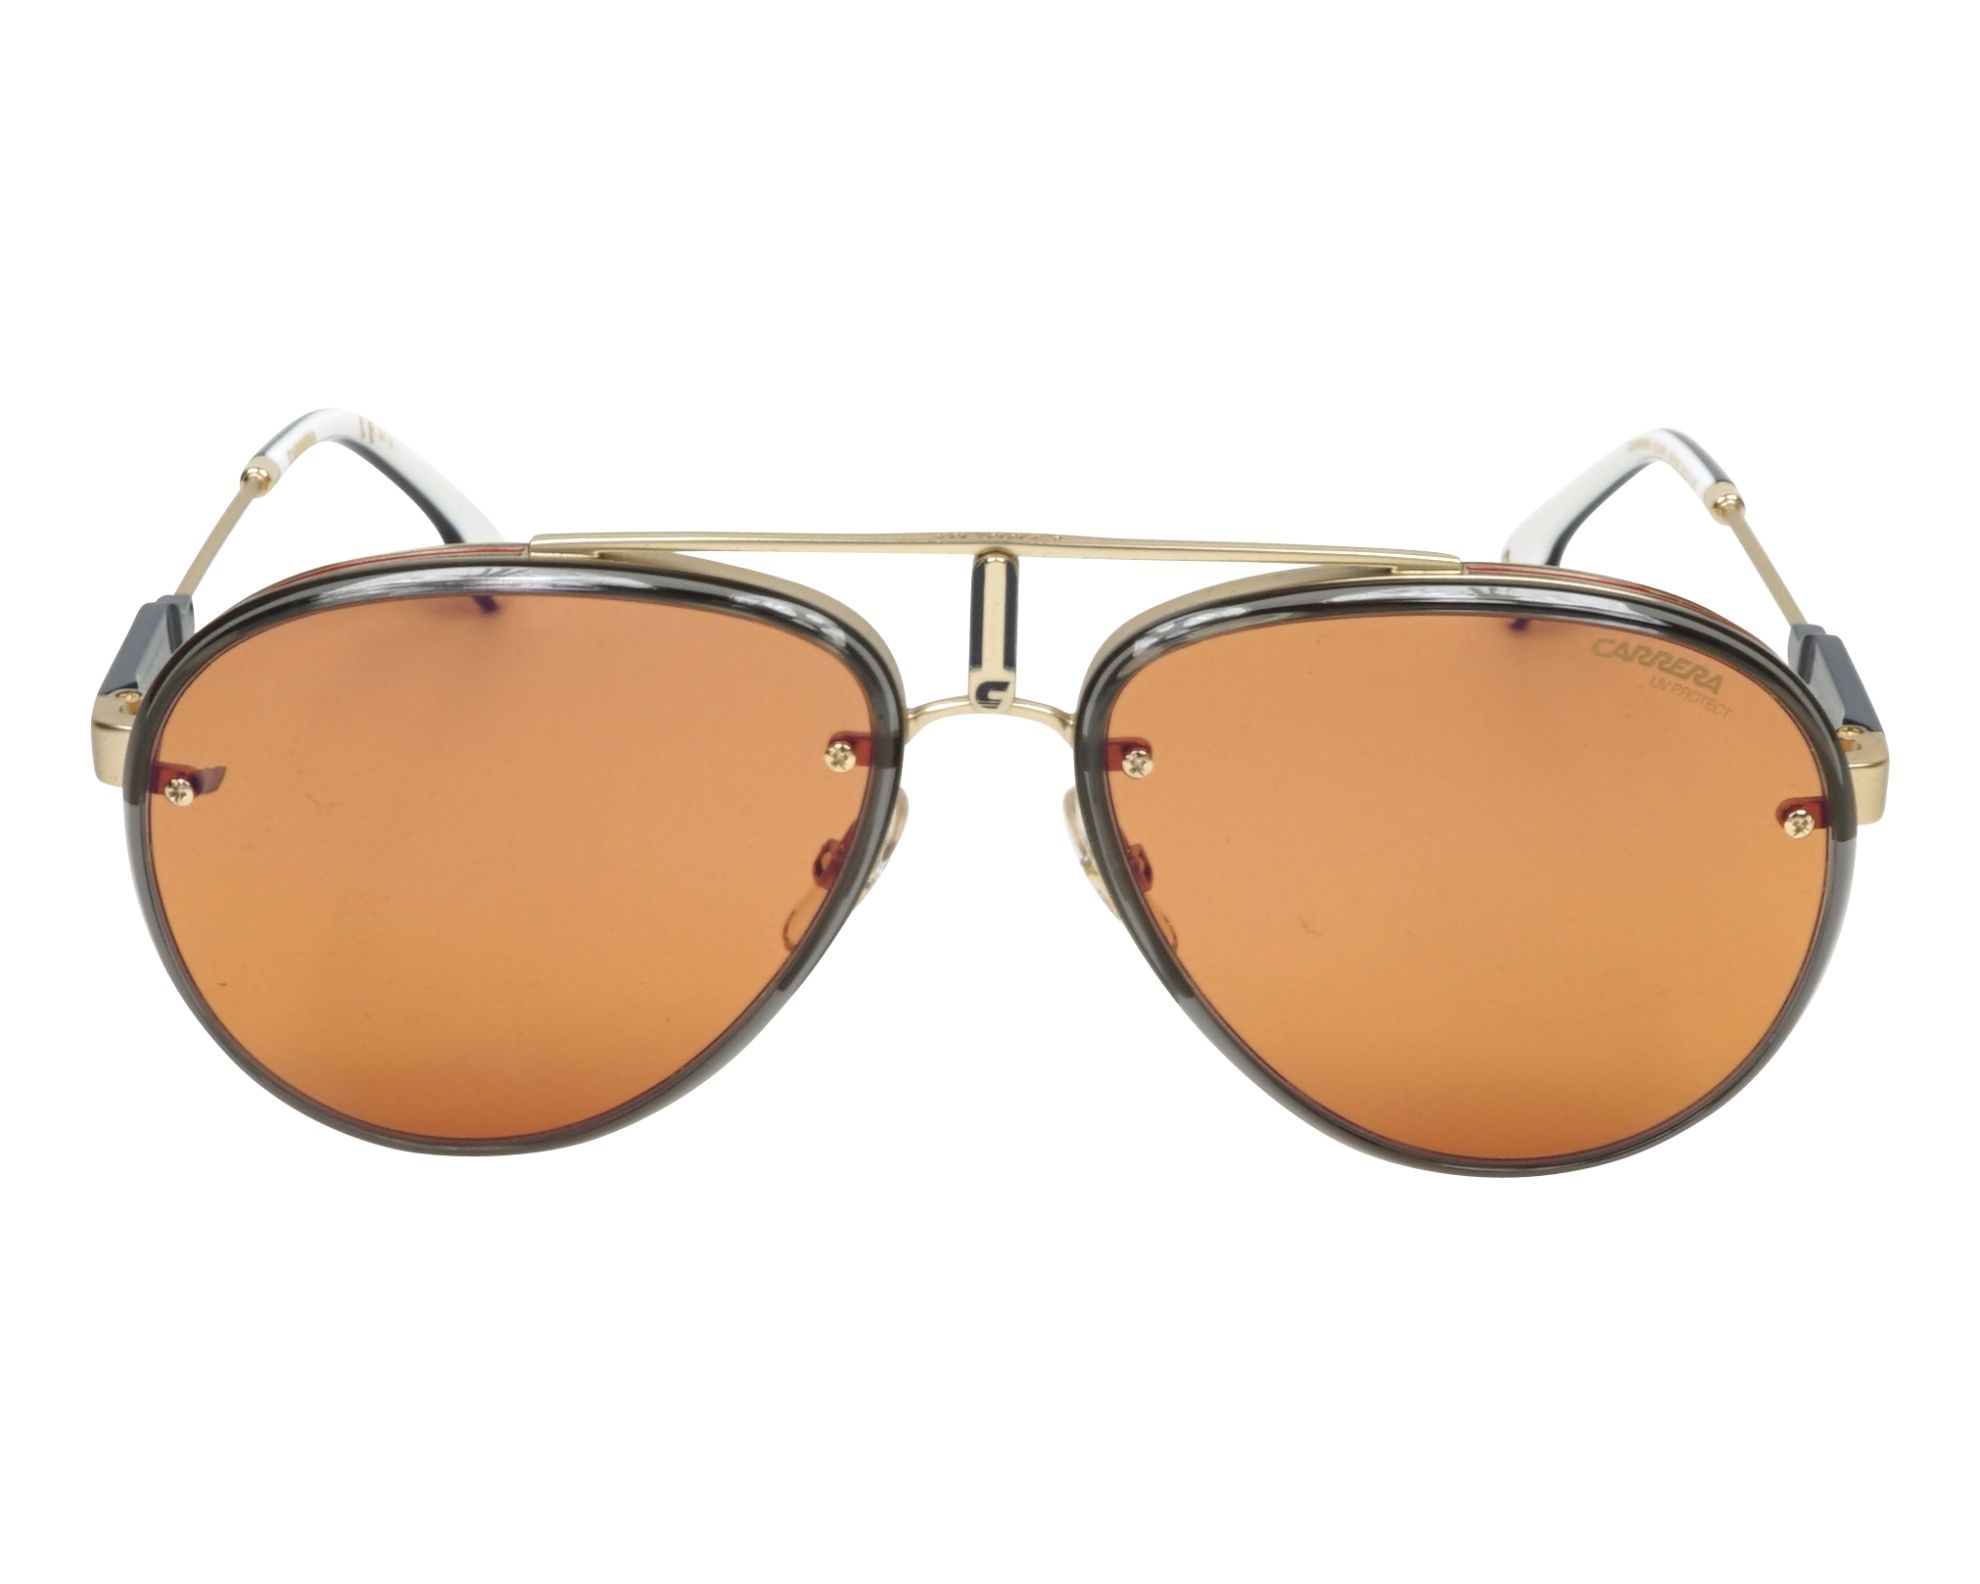 90c584c854 Sunglasses Carrera GLORY OFY DP 58-17 Gold Grey front view